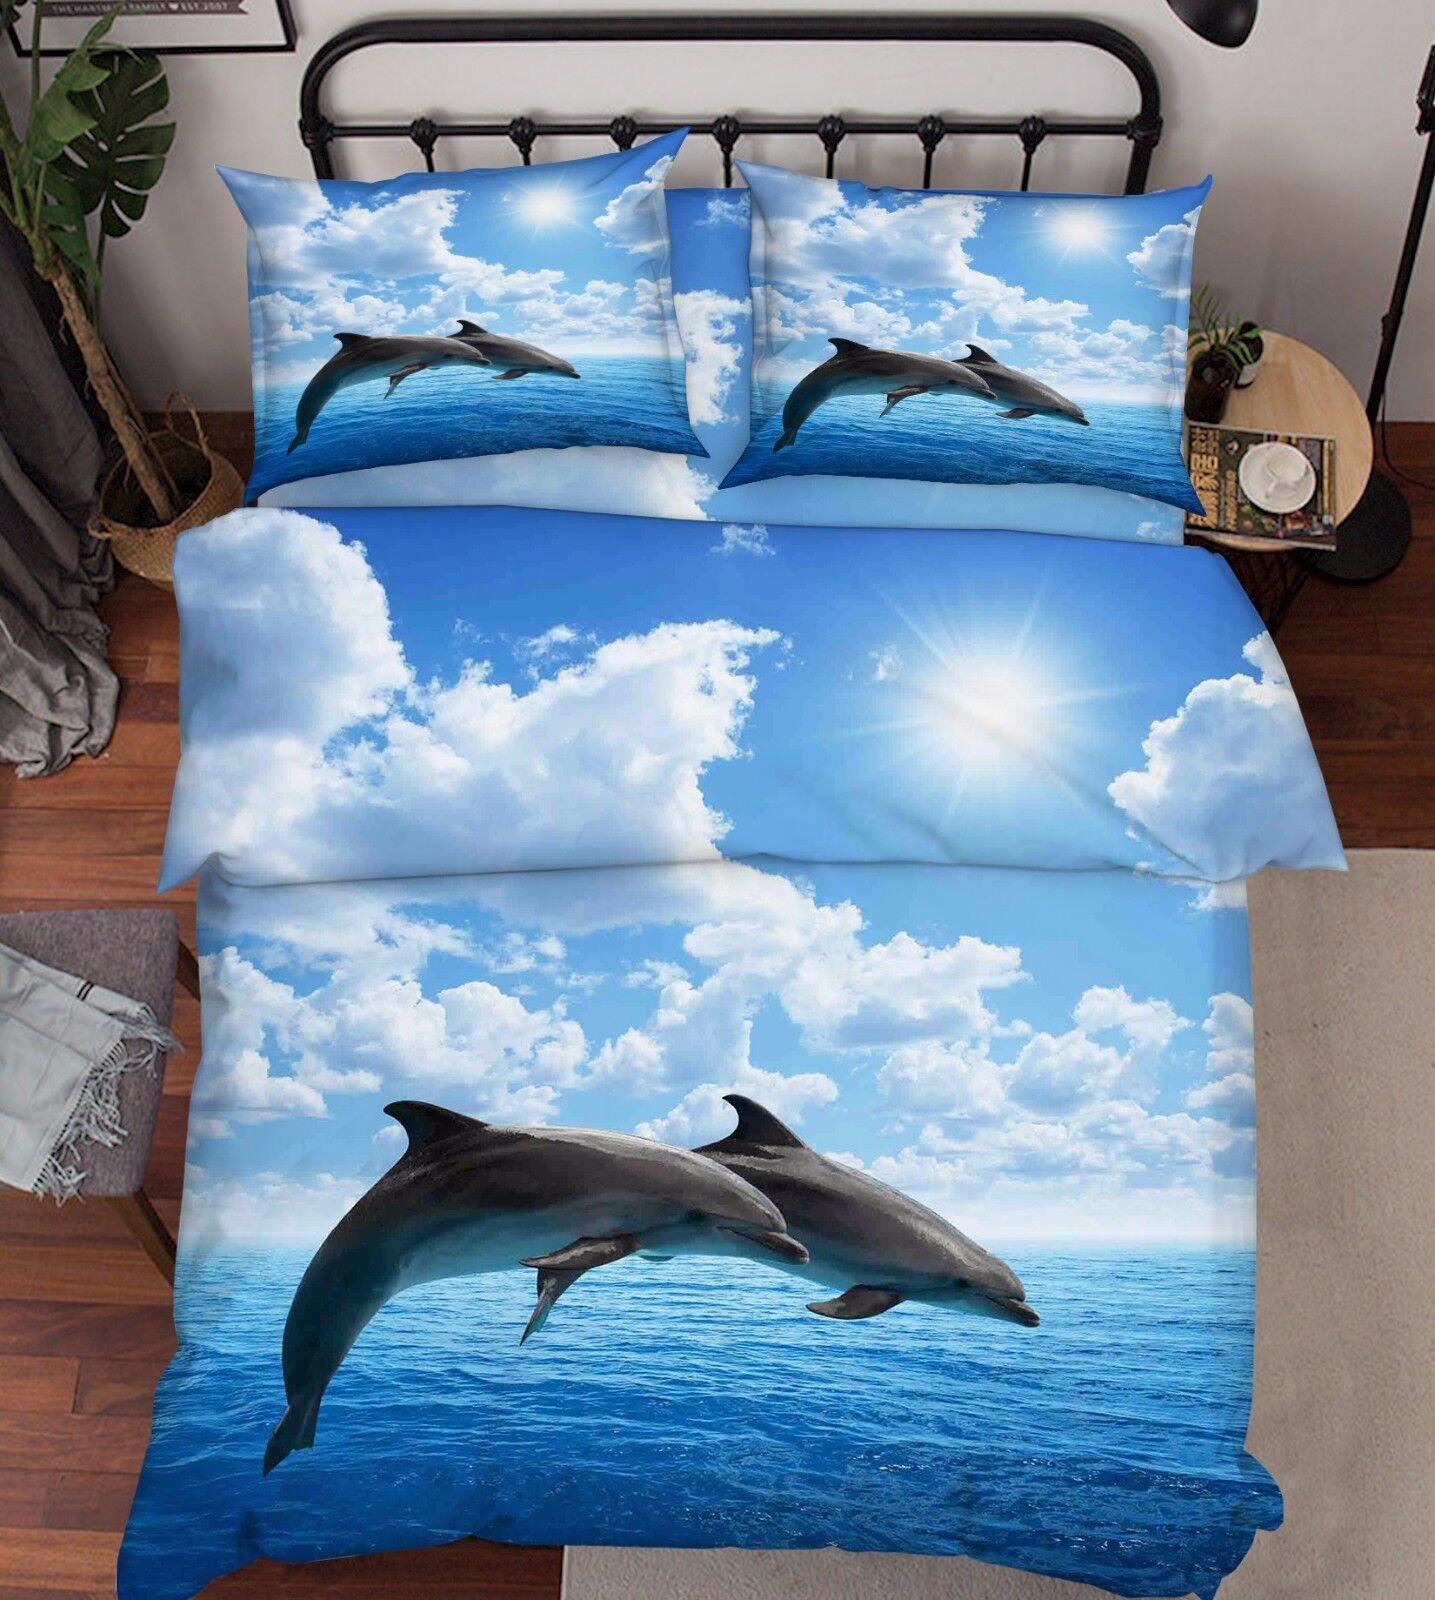 3D Sea Dolphins Bed Pillowcases Quilt Duvet Cover Set Single Queen King Size AU